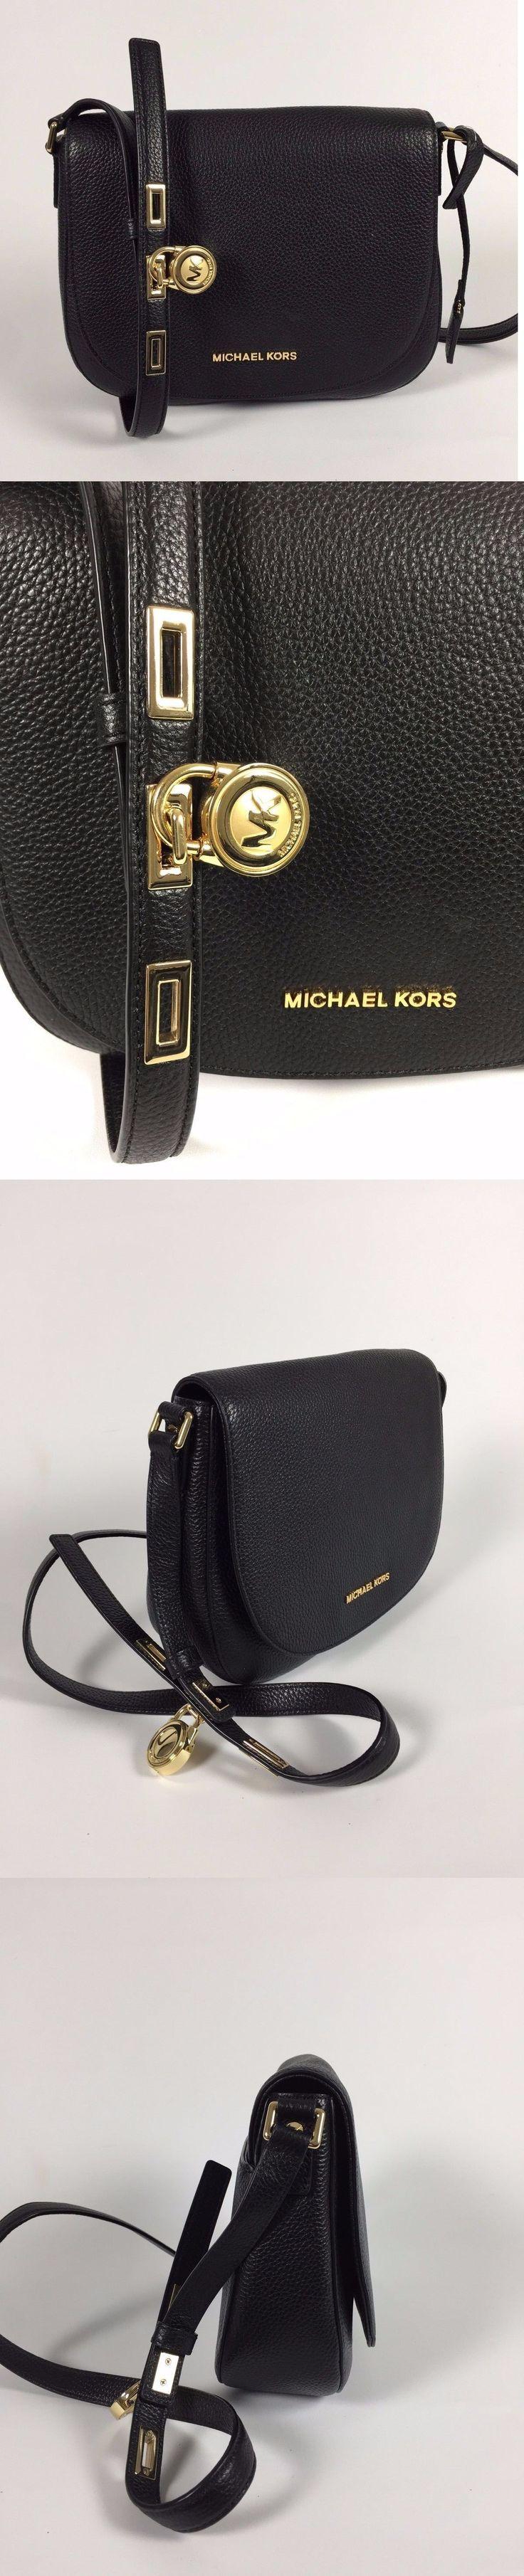 Women Handbags and Purses: Nwt Michael Kors Black Leather Large Hamilton Crossbody Messenger Bag New -> BUY IT NOW ONLY: $199 on eBay!